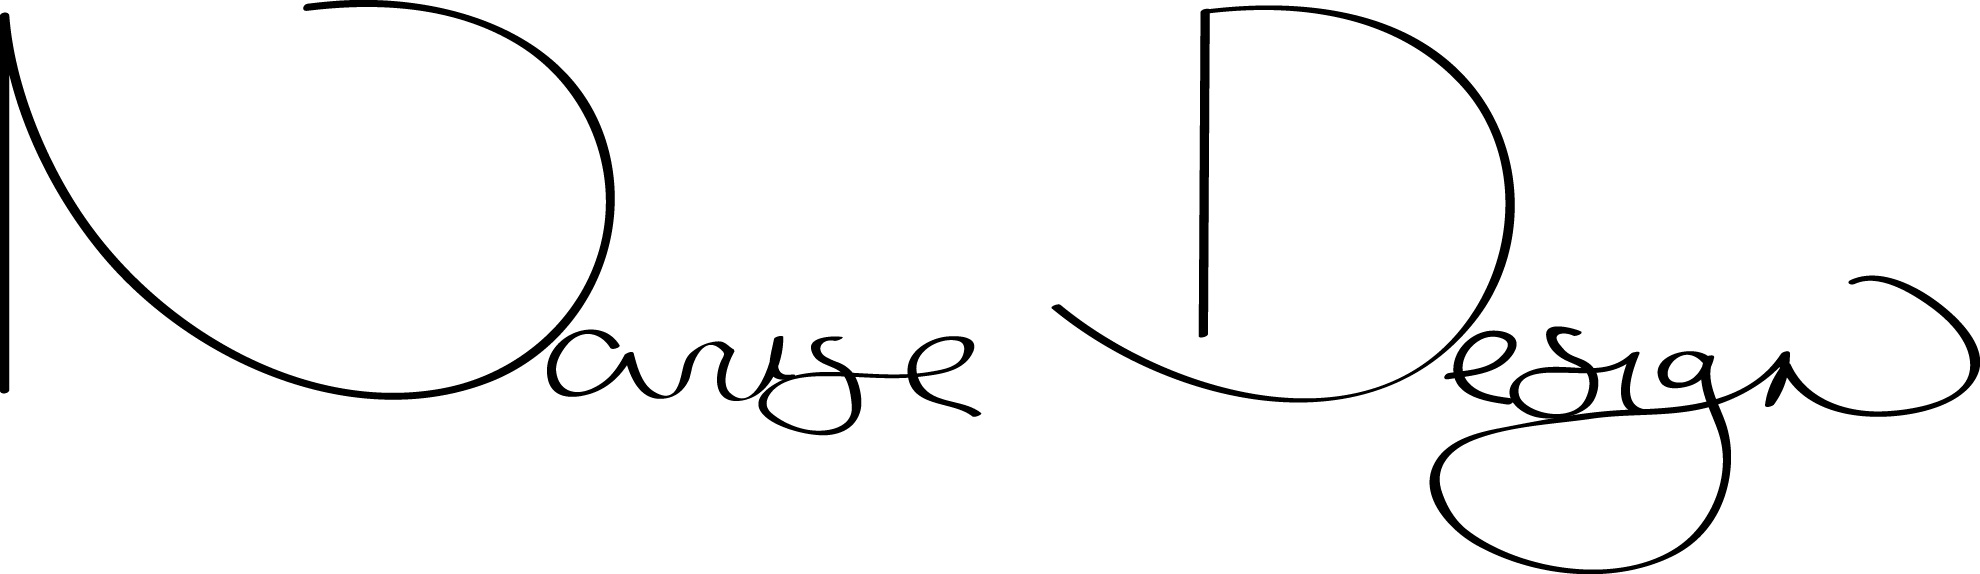 Naruse Design's Signature